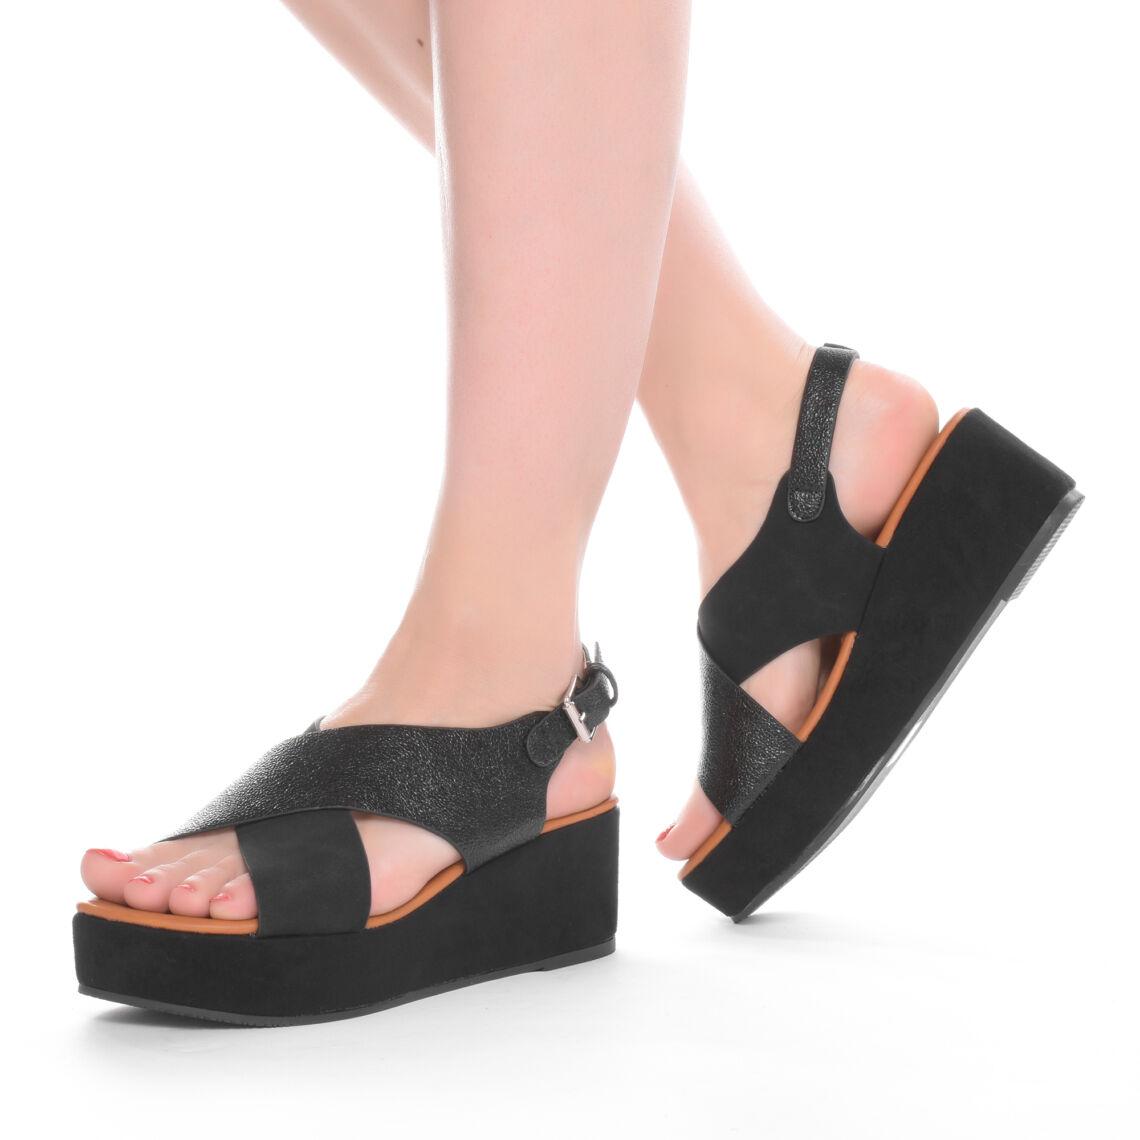 8ee35ac5f8 Női Fekete Műbőr Telitalpú Szandál - TELITALPÚ SZANDÁLOK - Női cipő ...